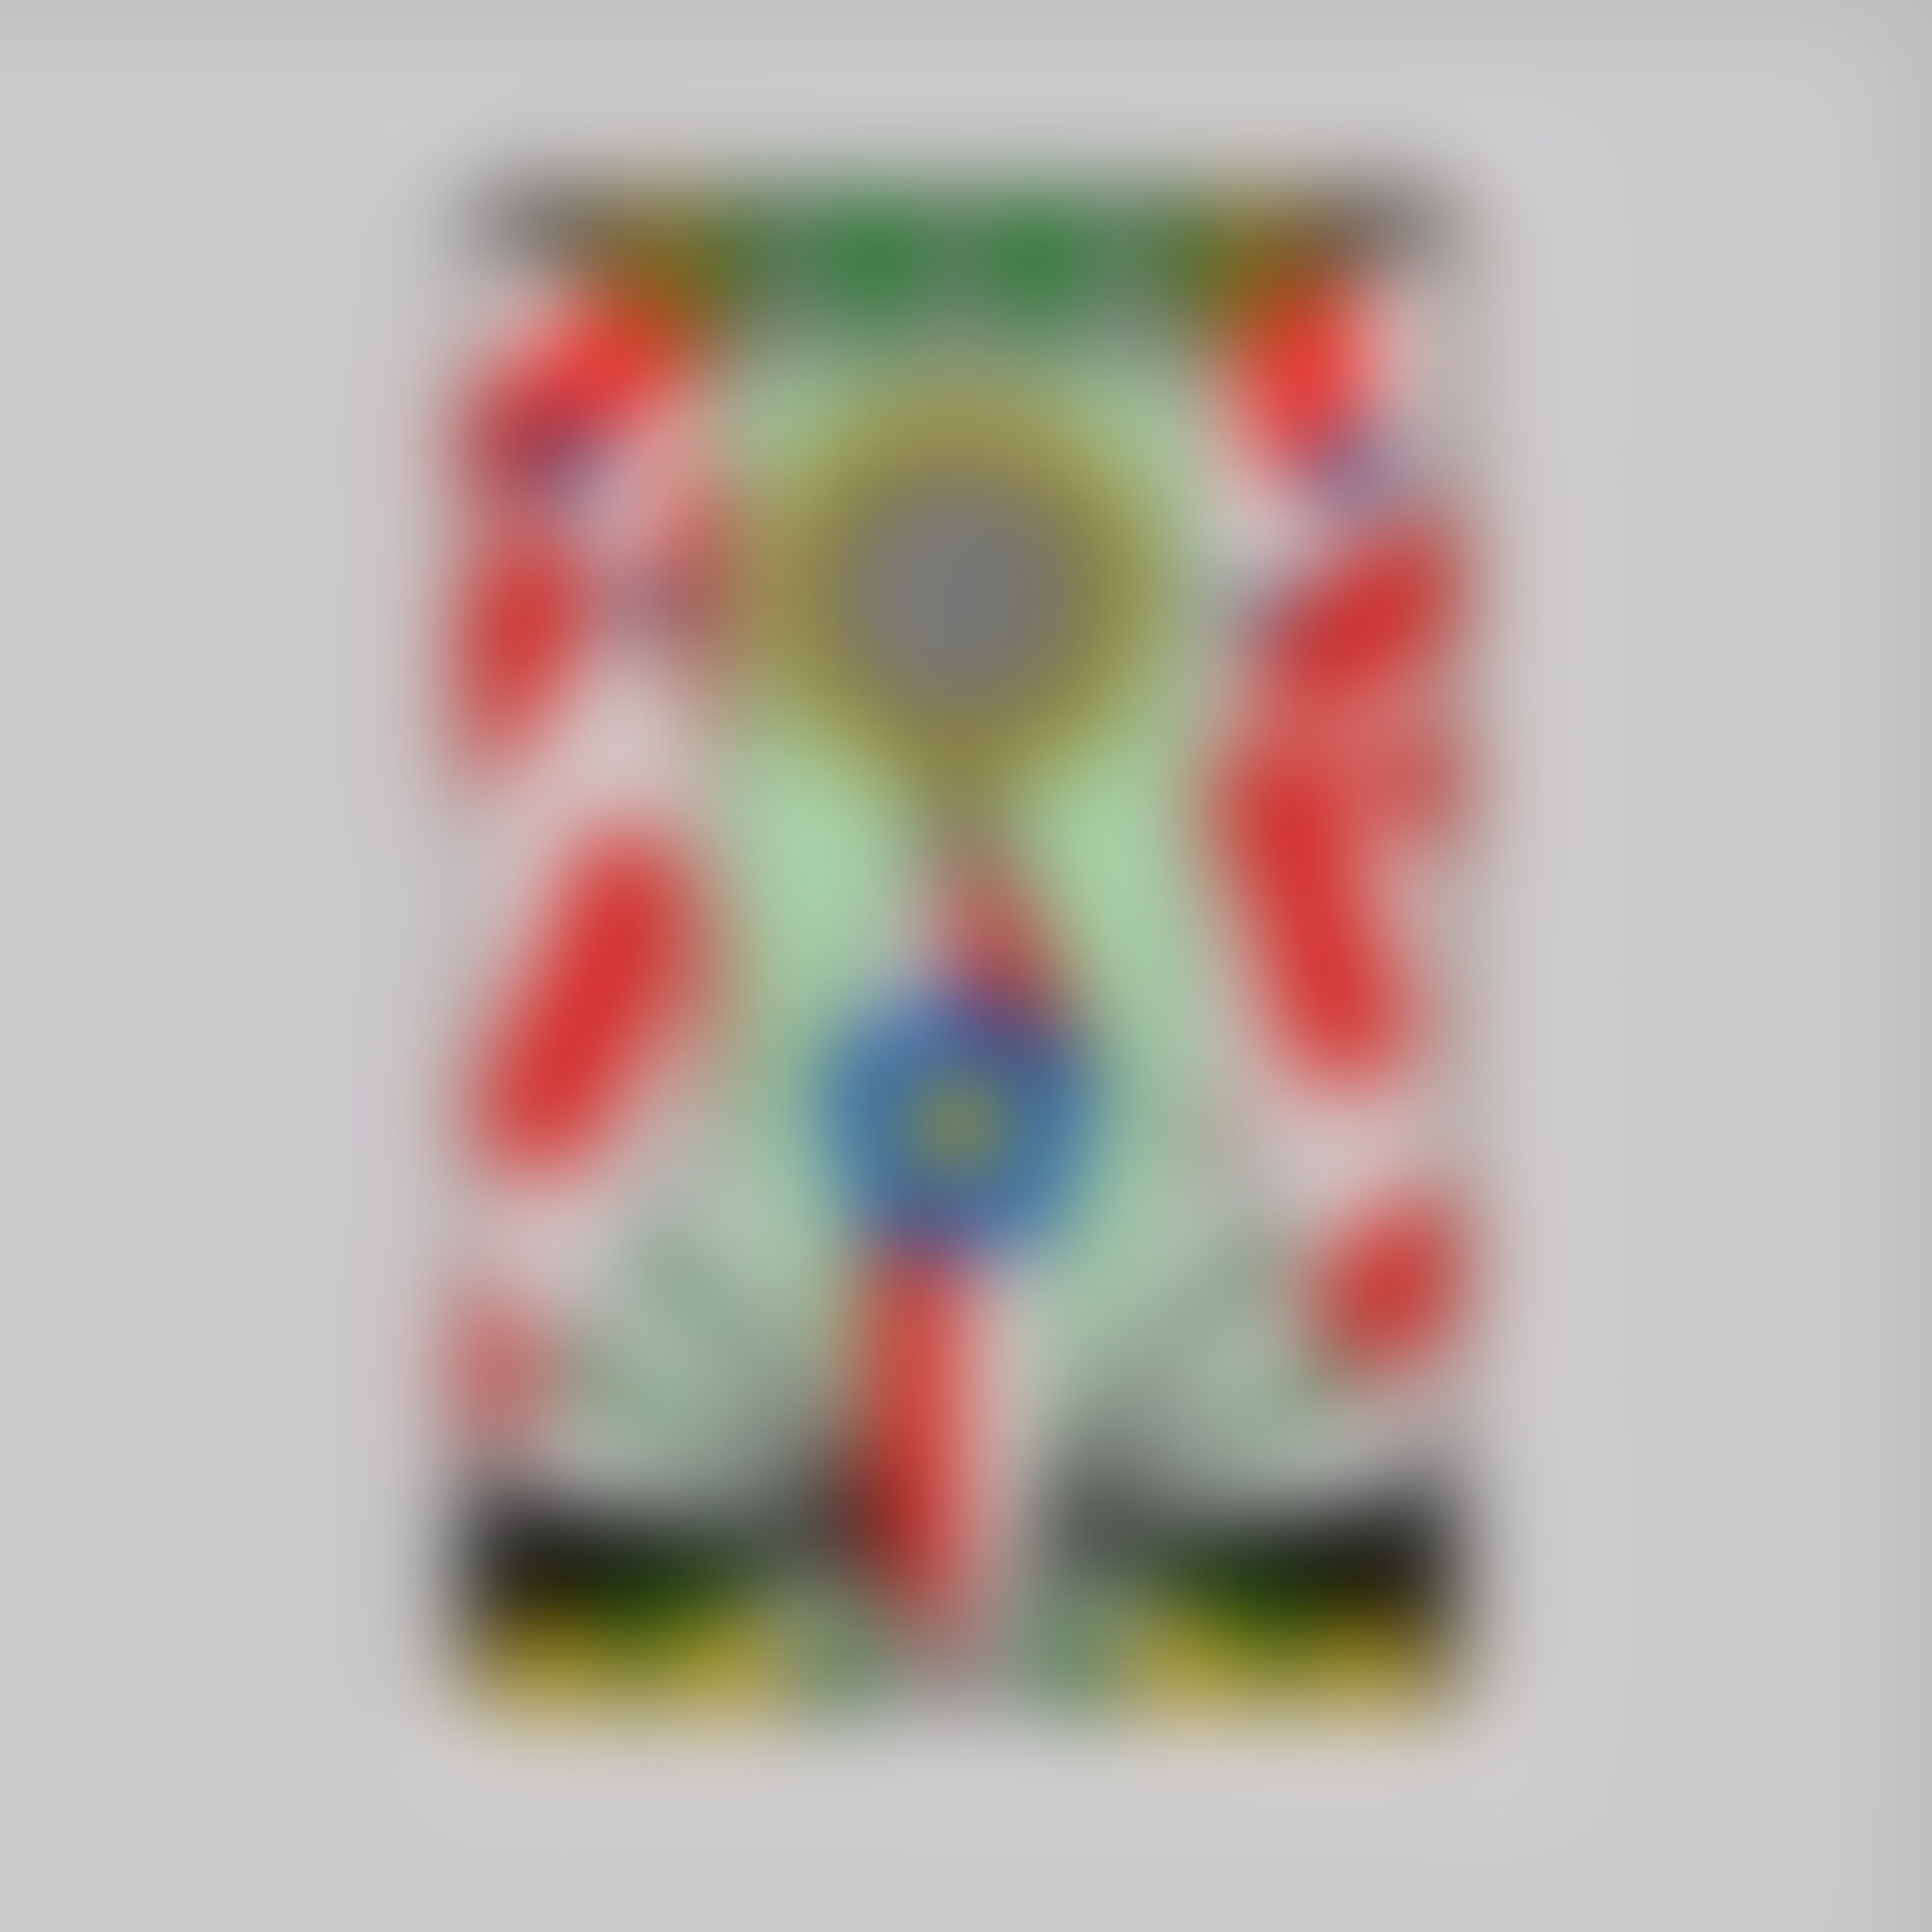 Gabriella Marcella Templen Art Print 2014 autocompressfitresizeixlibphp 1 1 0max h2000max w3 D2000q80s669a8749d3a8ae0c223b38e4bc23773b